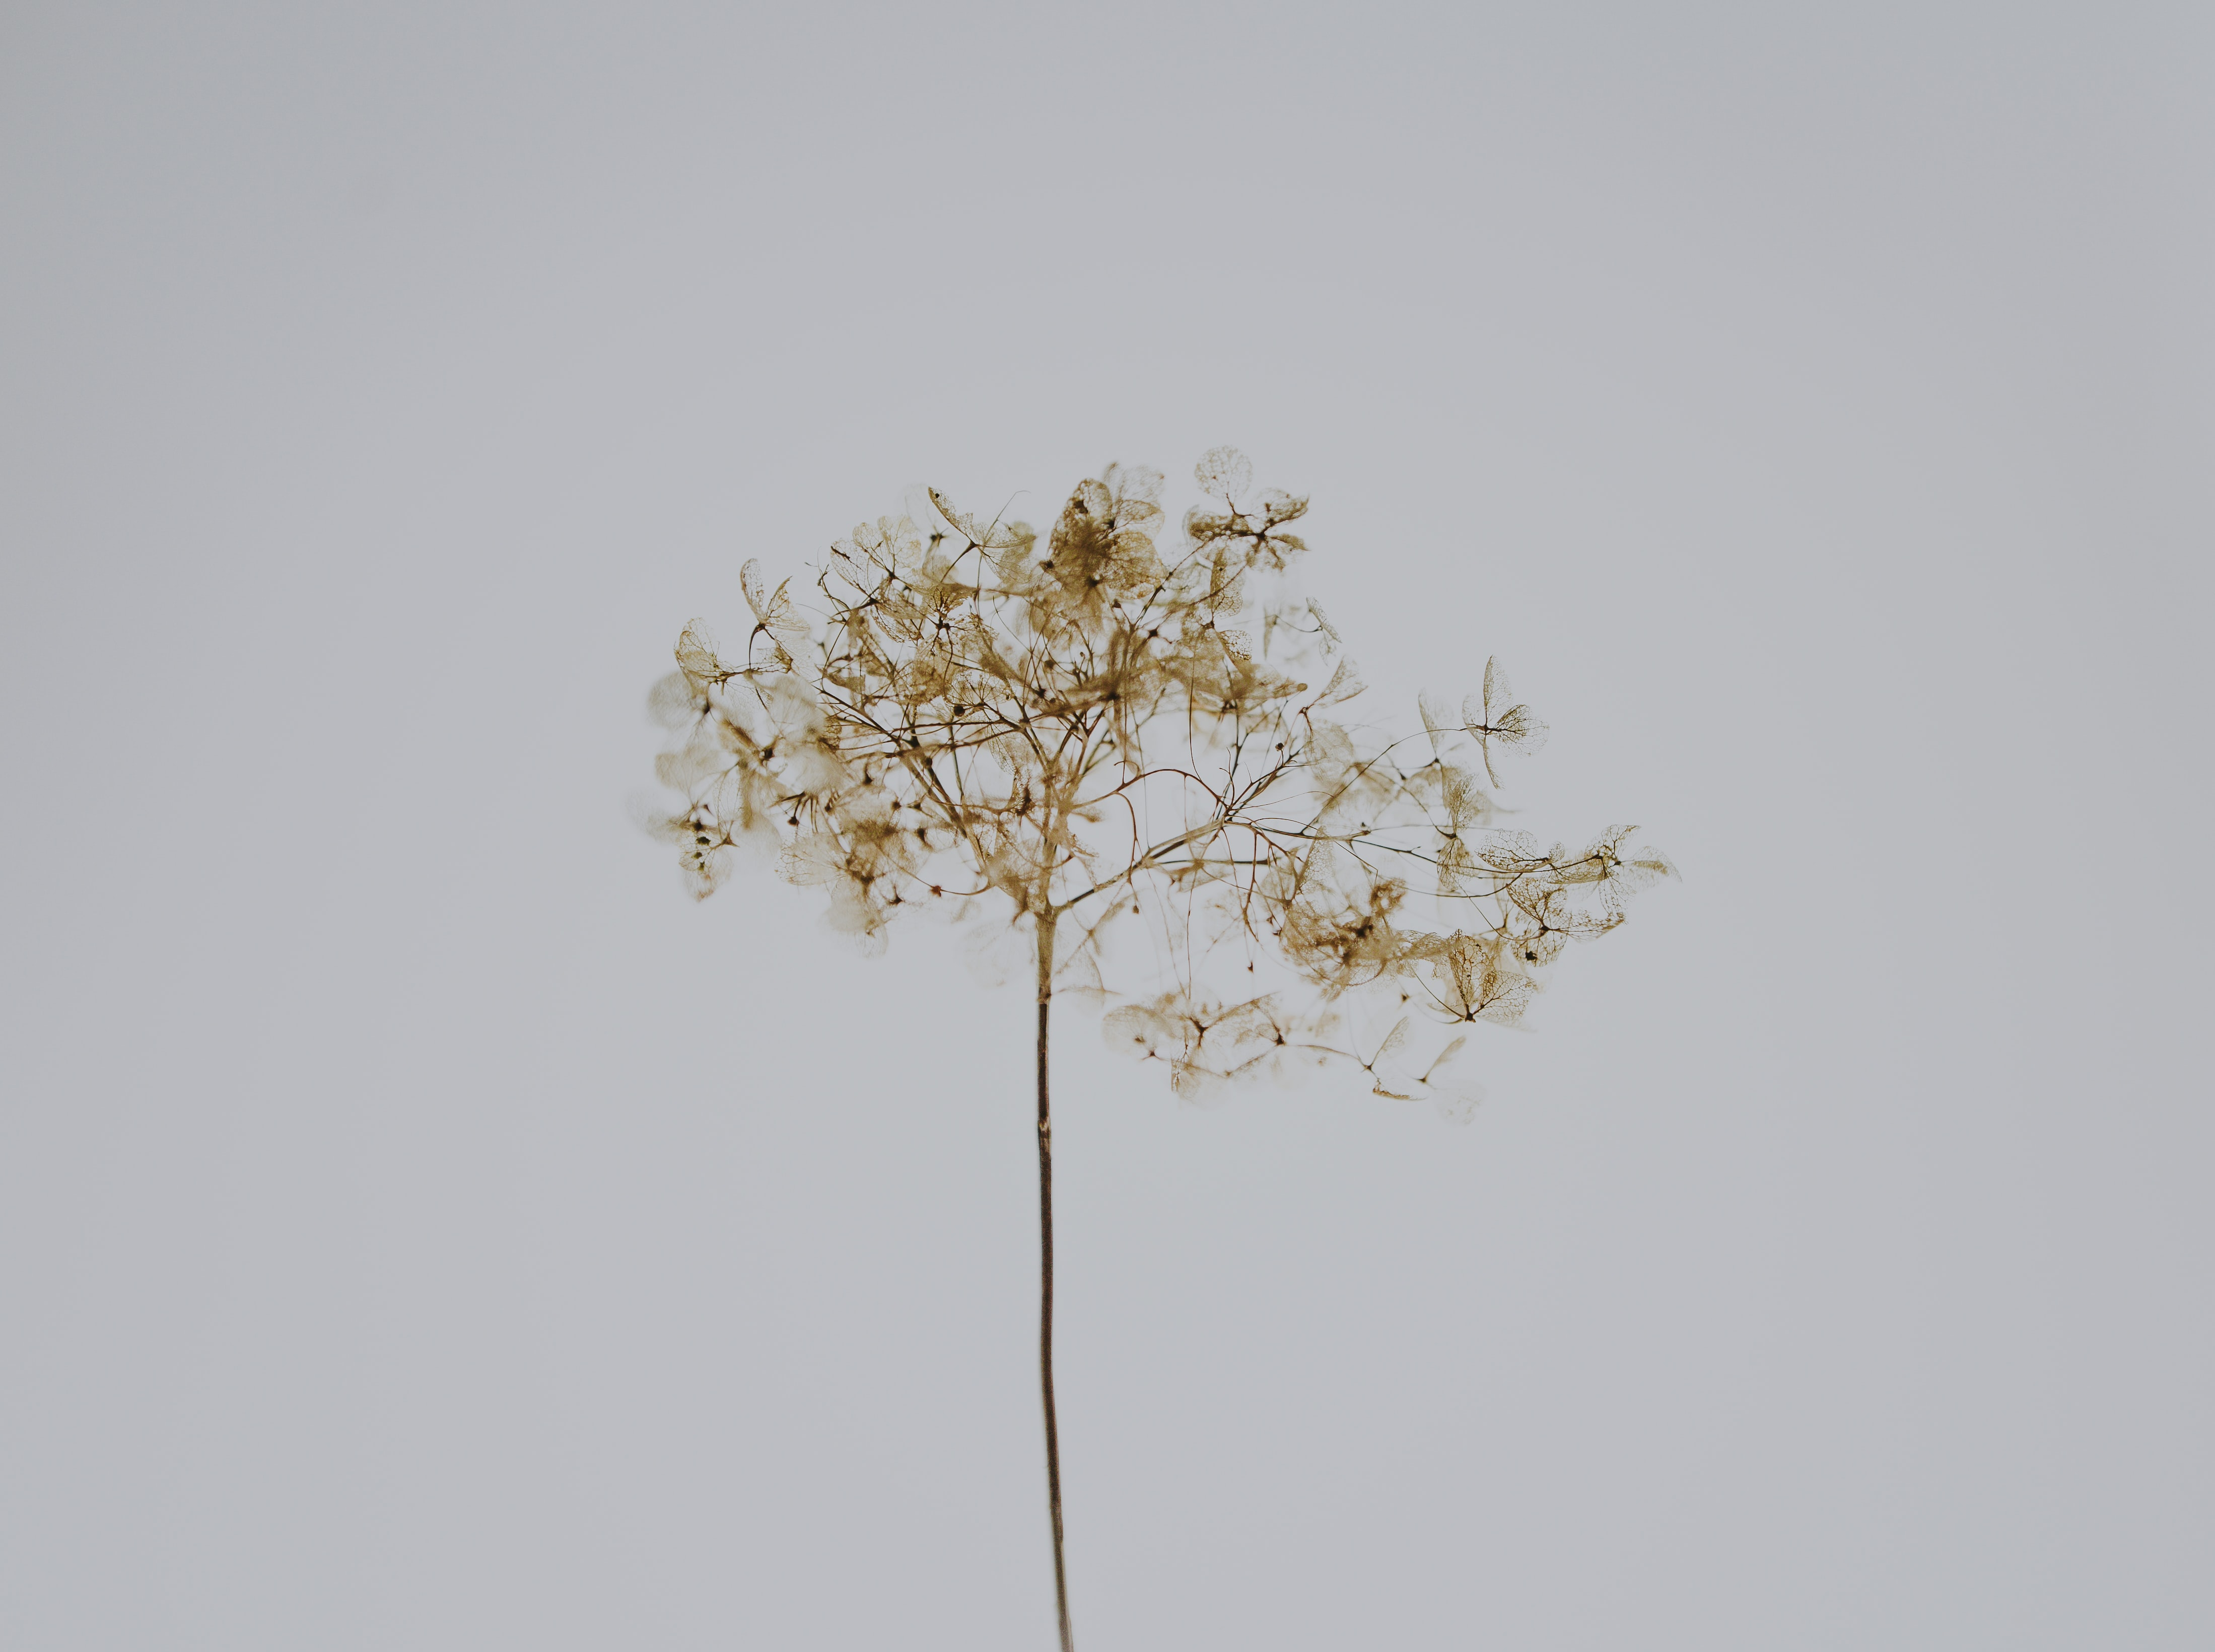 brown dandelion